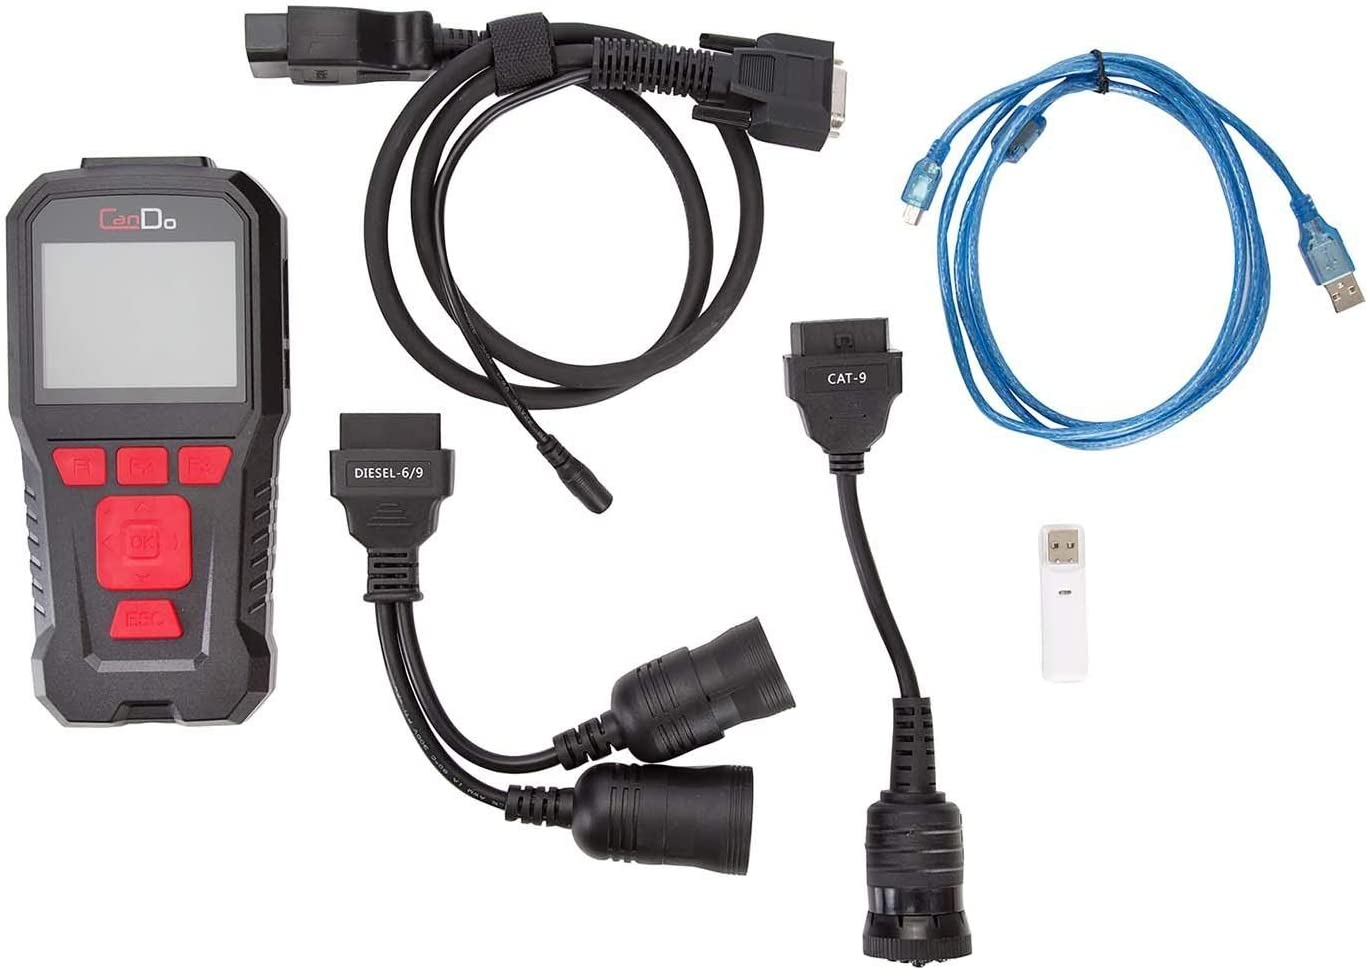 HD Code II Handheld Commercial Truck Engine Transmission Scanner with DPF Regen